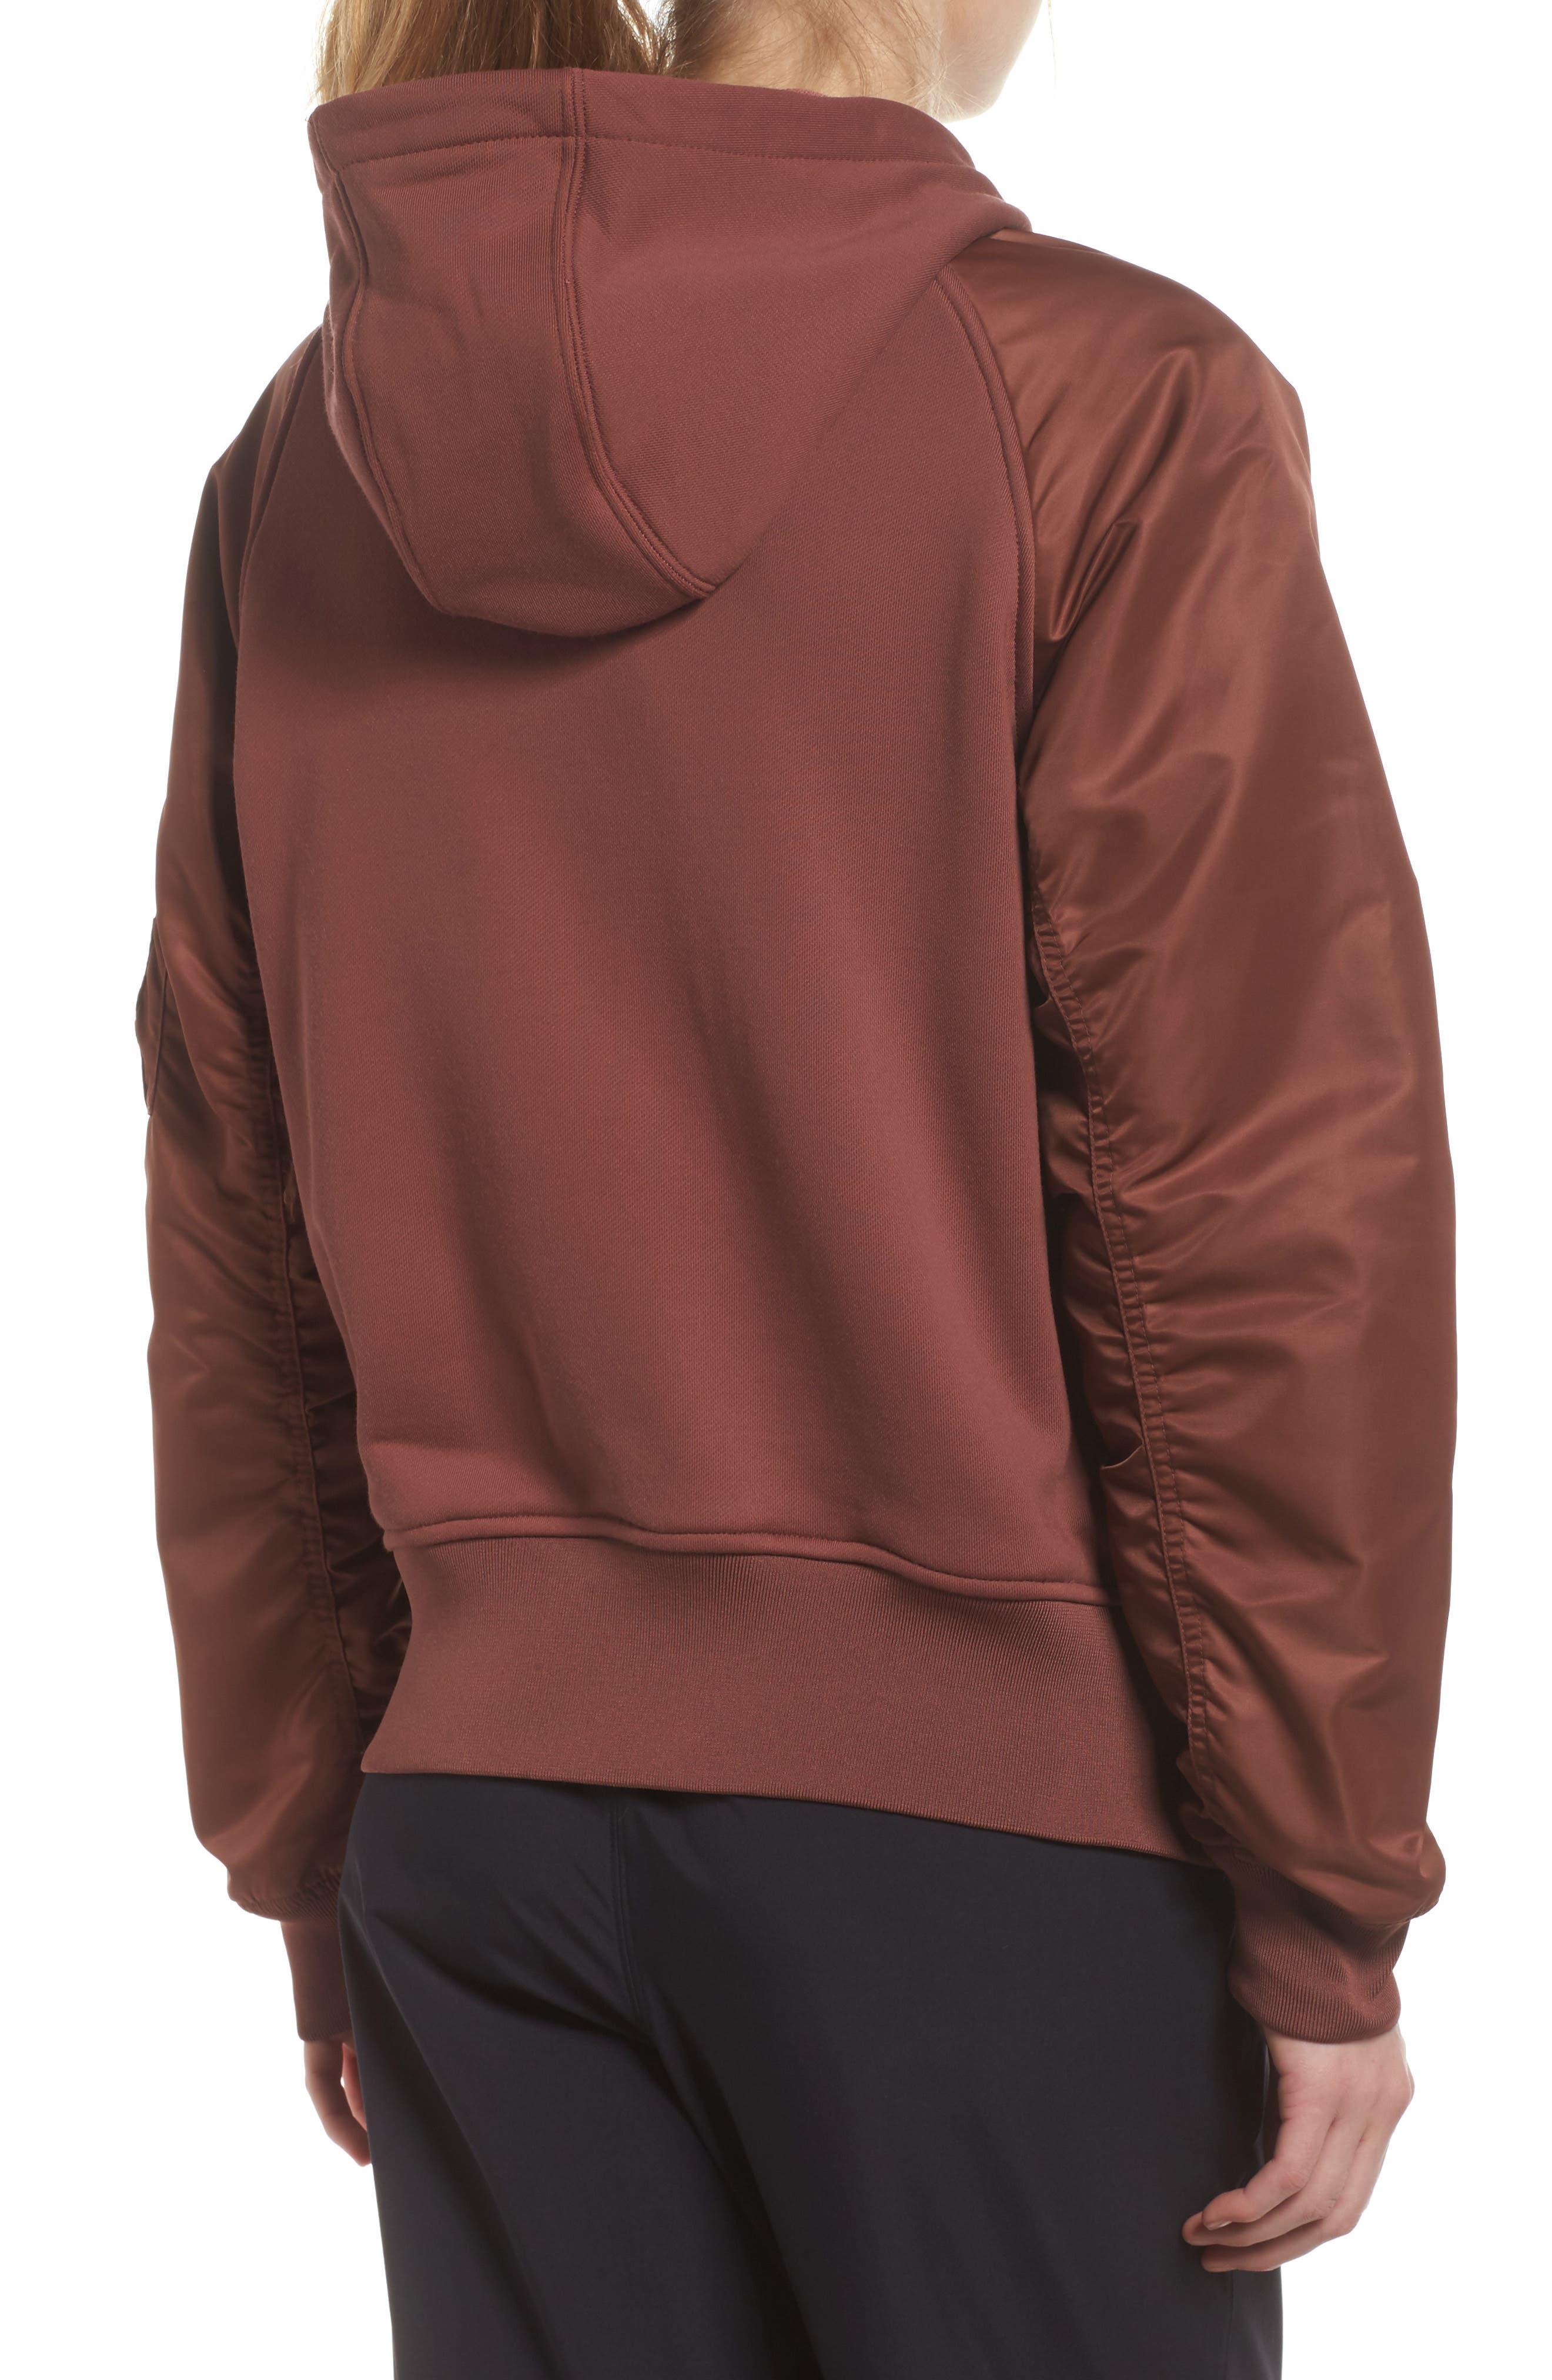 NikeLab Women's Mixed Media Bomber Jacket,                             Alternate thumbnail 4, color,